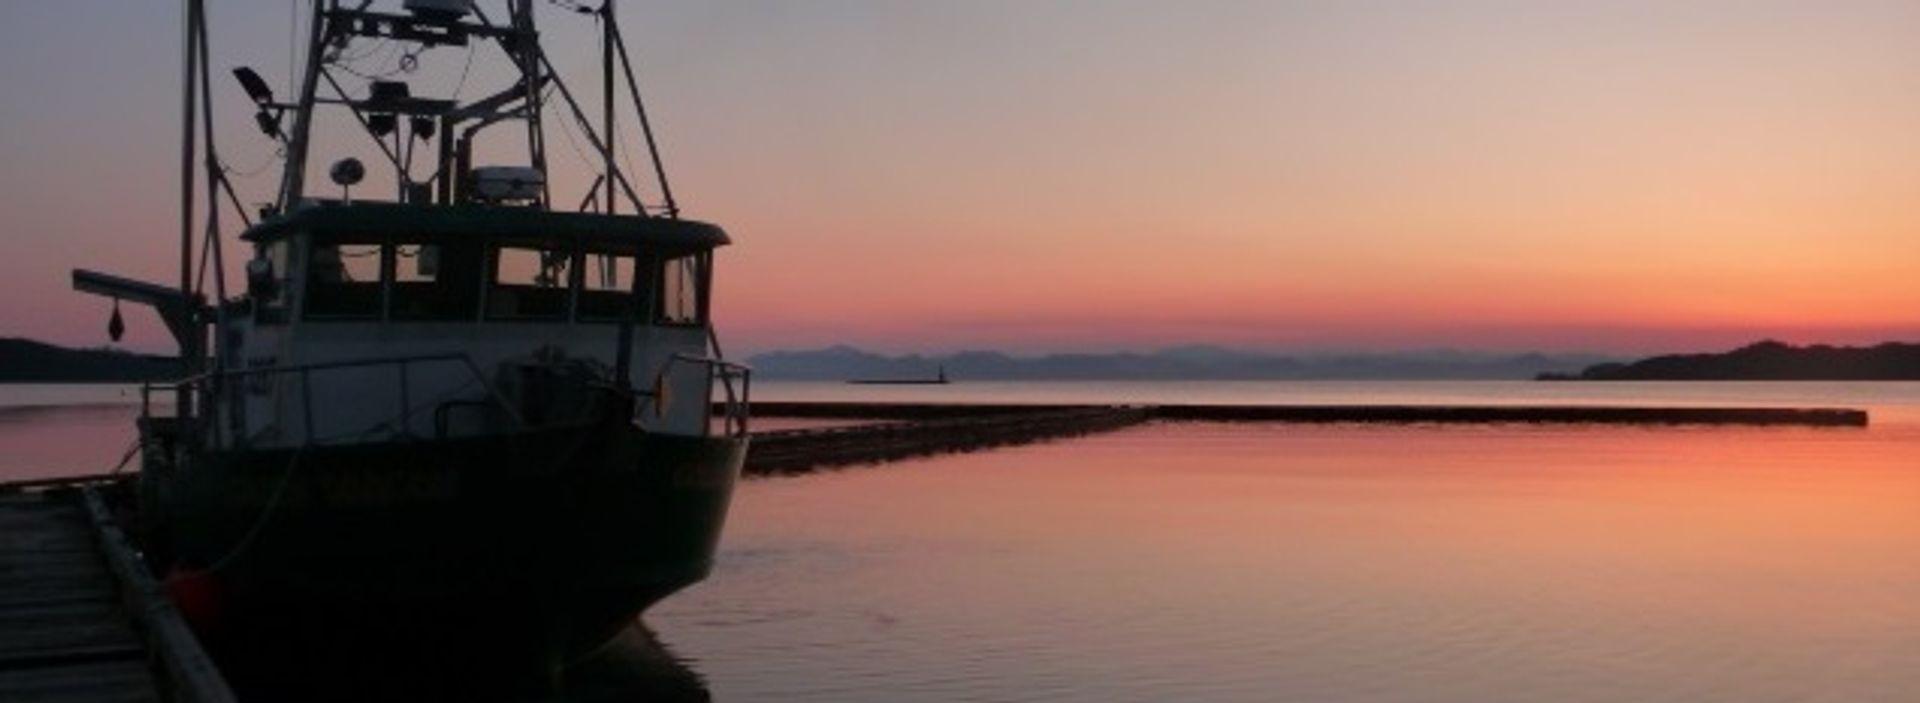 Sunset Hostel Vancouver Island